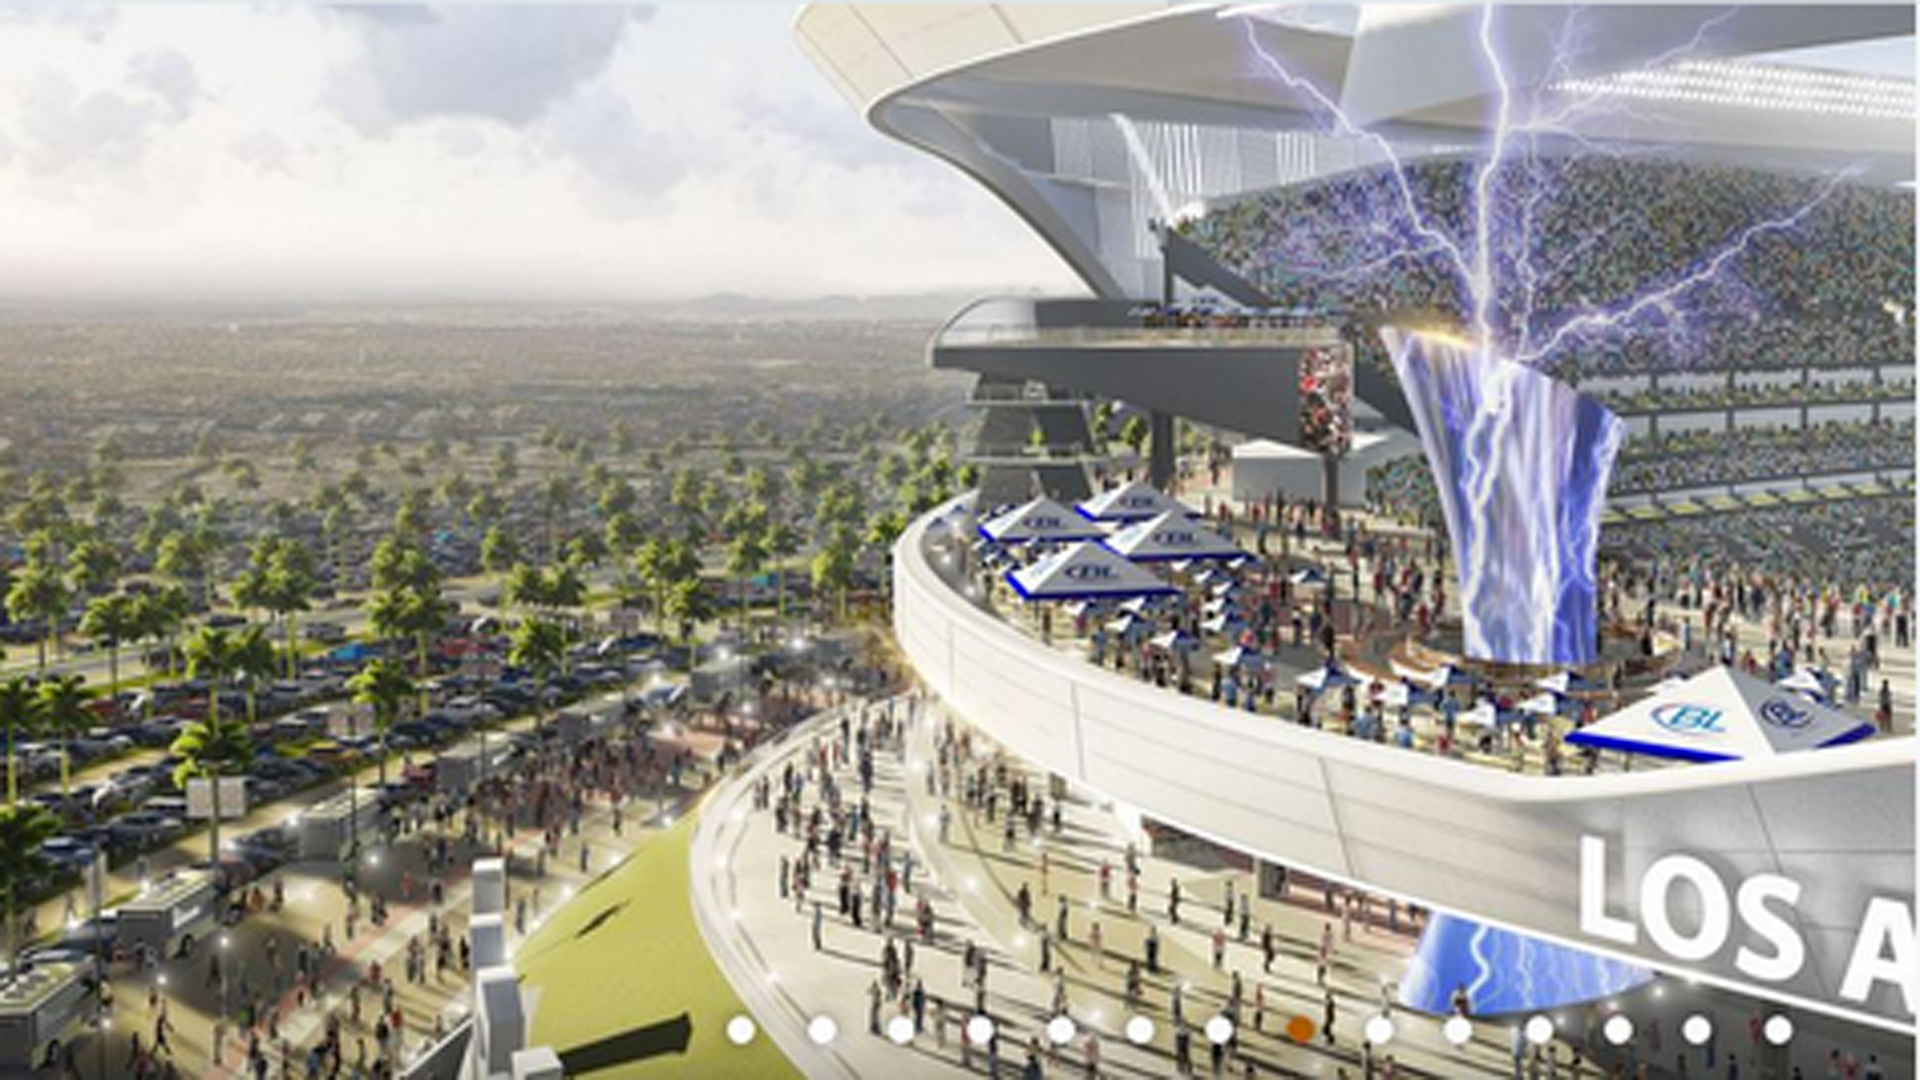 Chargers-la-stadium-042515-twitter-ftr